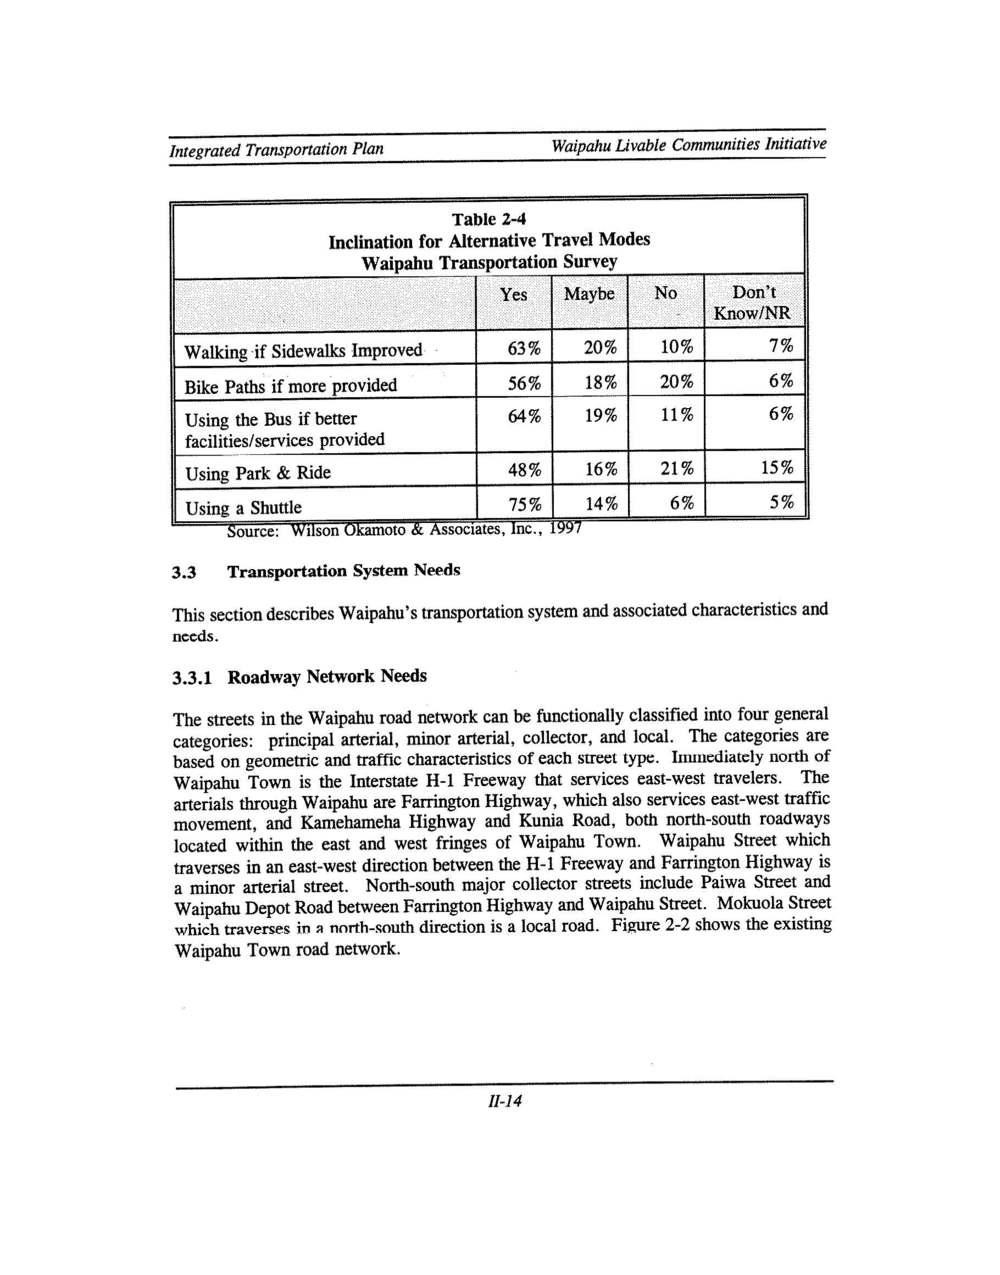 160531_WaipahuLivableCommunities(1998)_Page_029.jpg